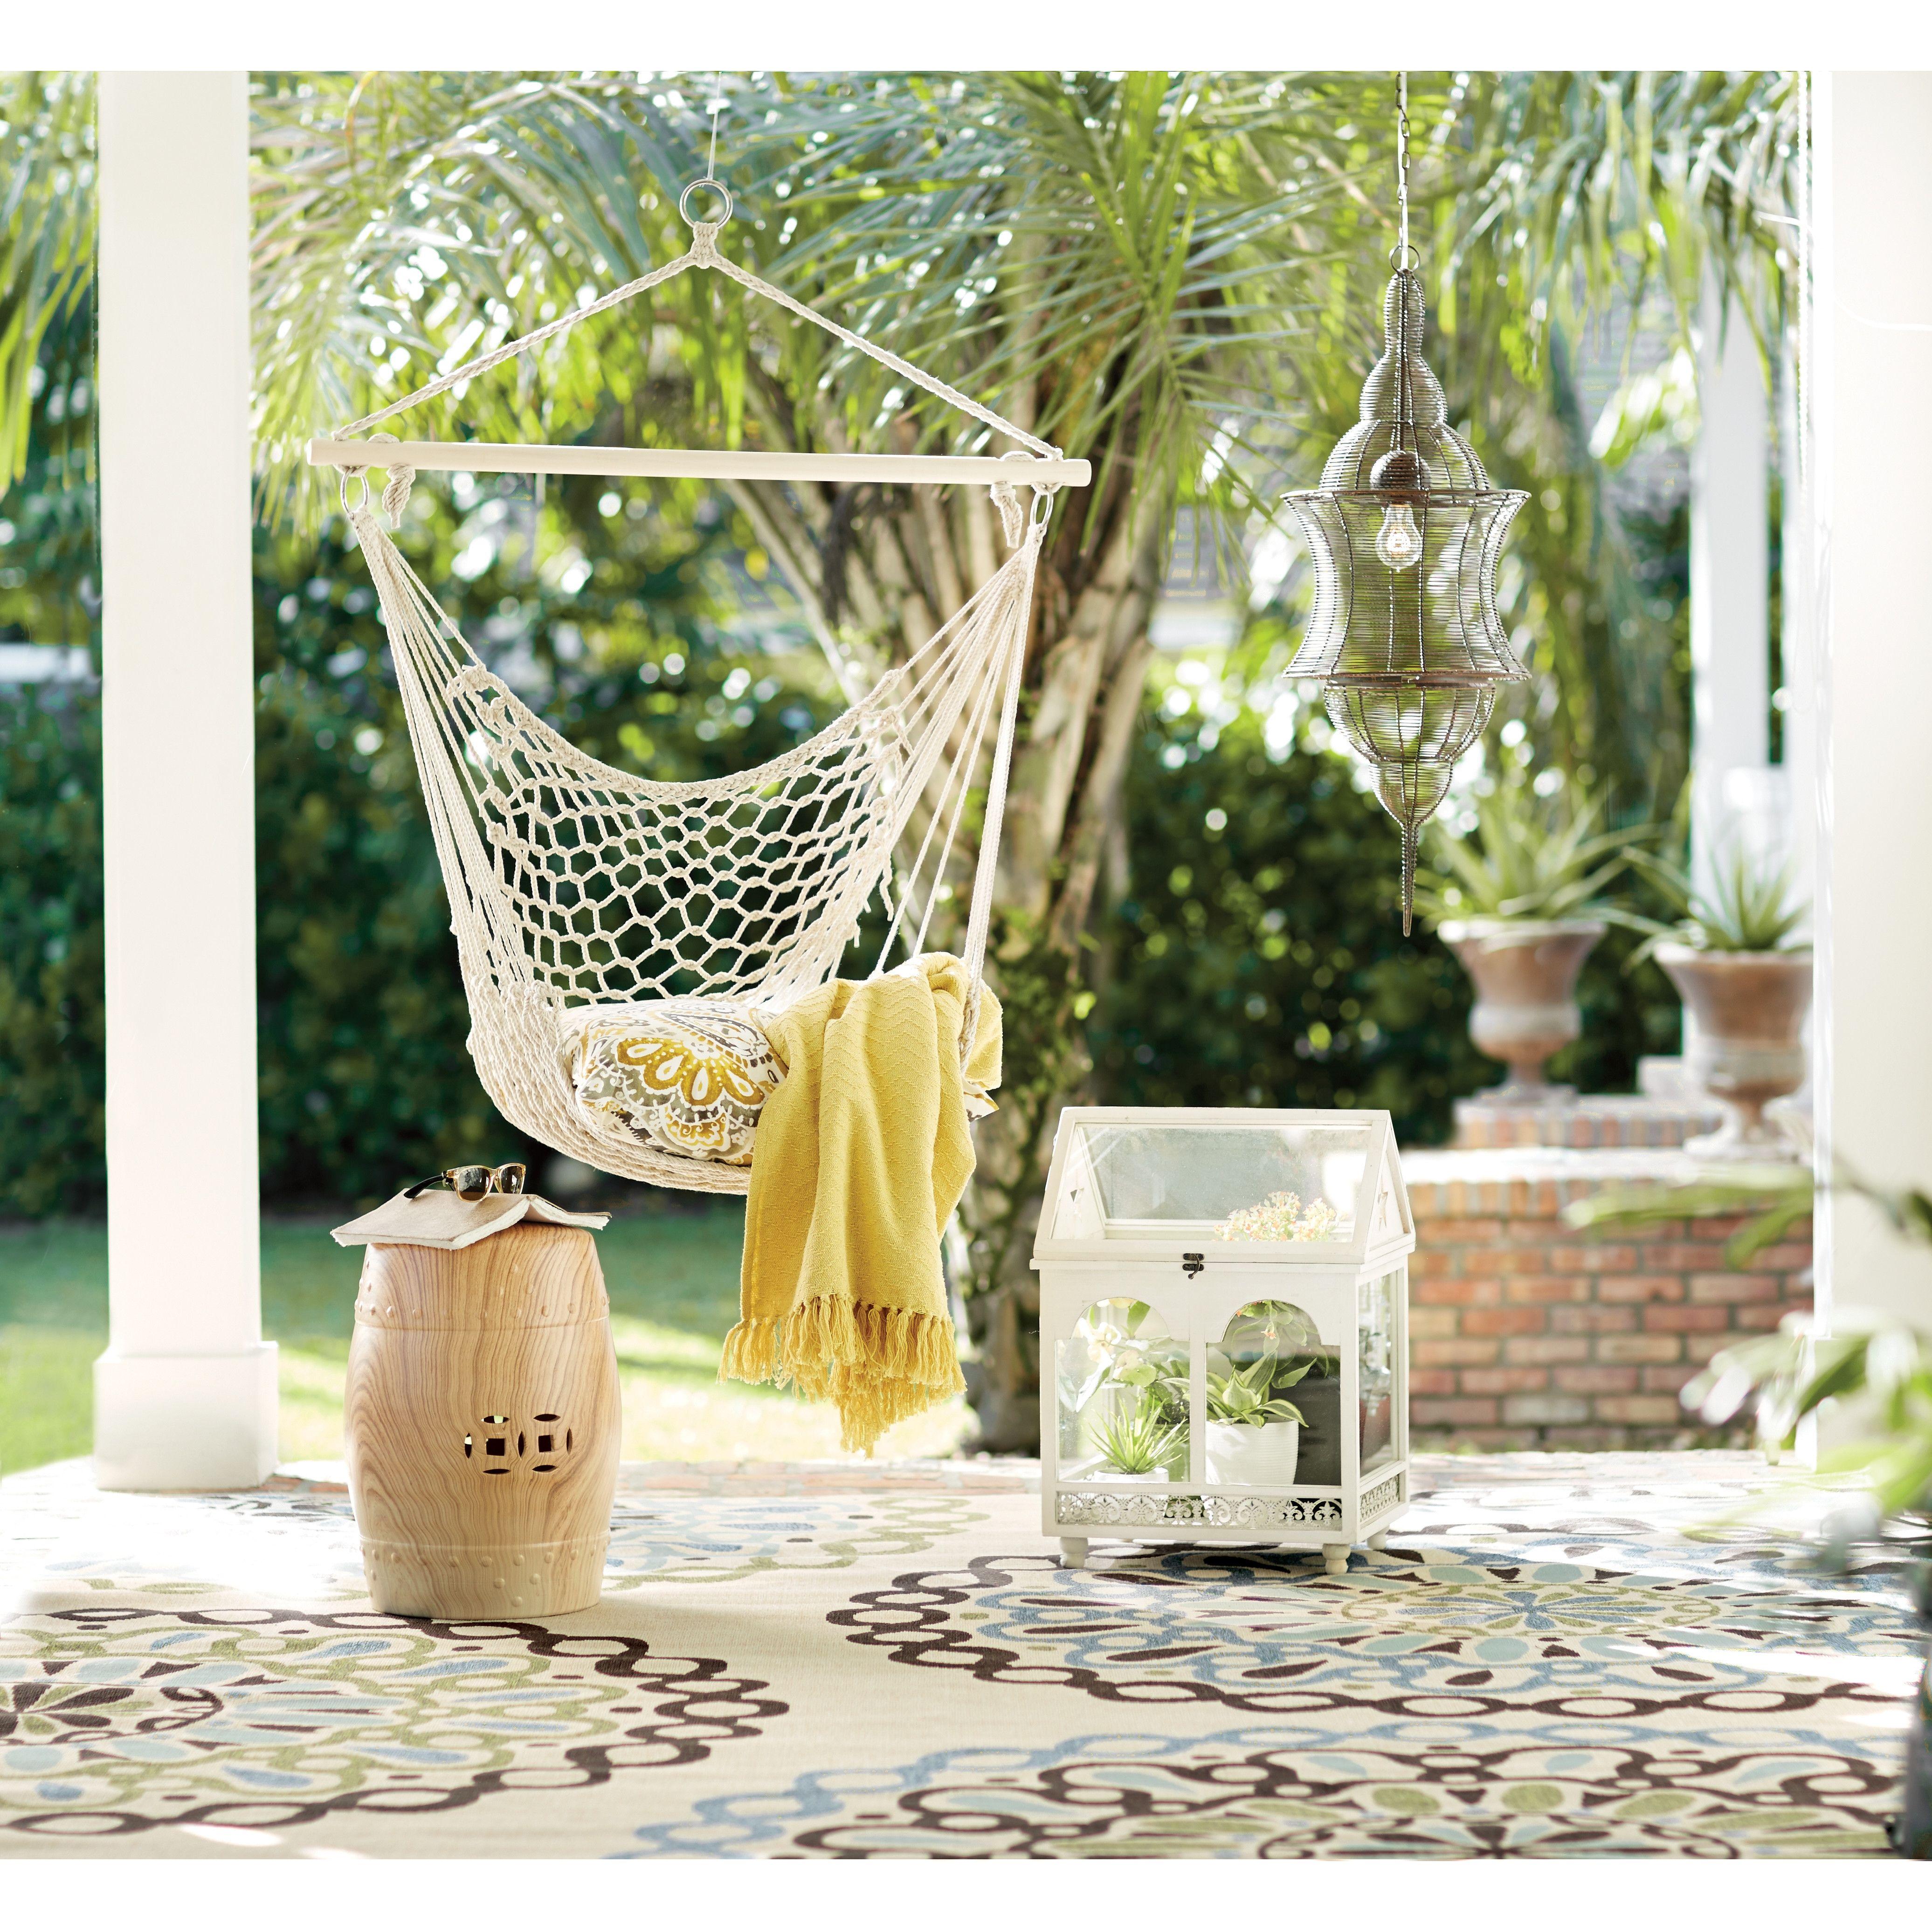 beachcrest home parker woven cotton chair hammock beachcrest home parker woven cotton chair hammock   for the garden      rh   pinterest